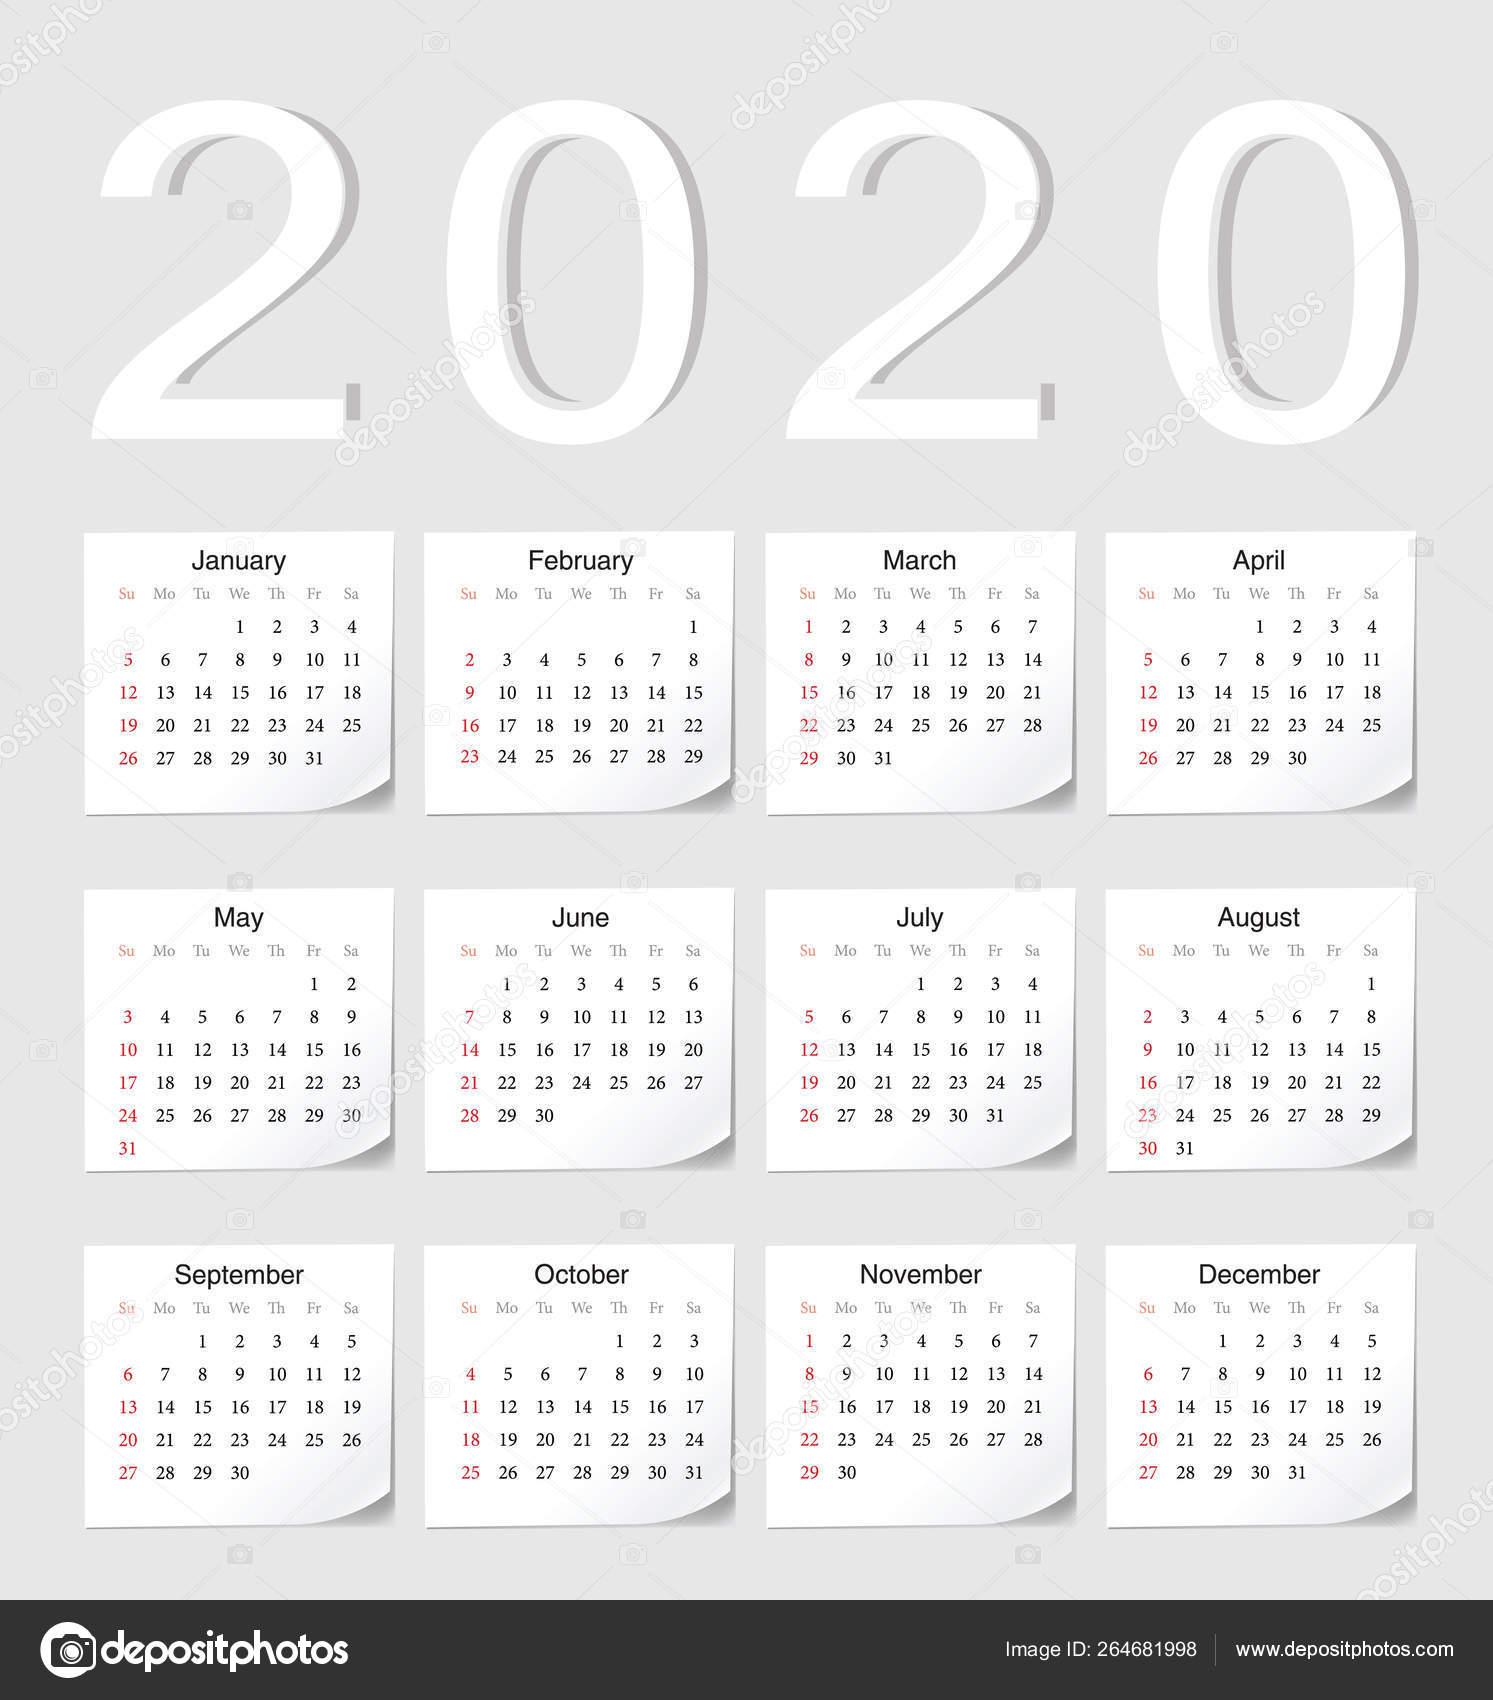 Календарь 2020 Года  Bagno.site throughout Kalendar Kuda July 2020